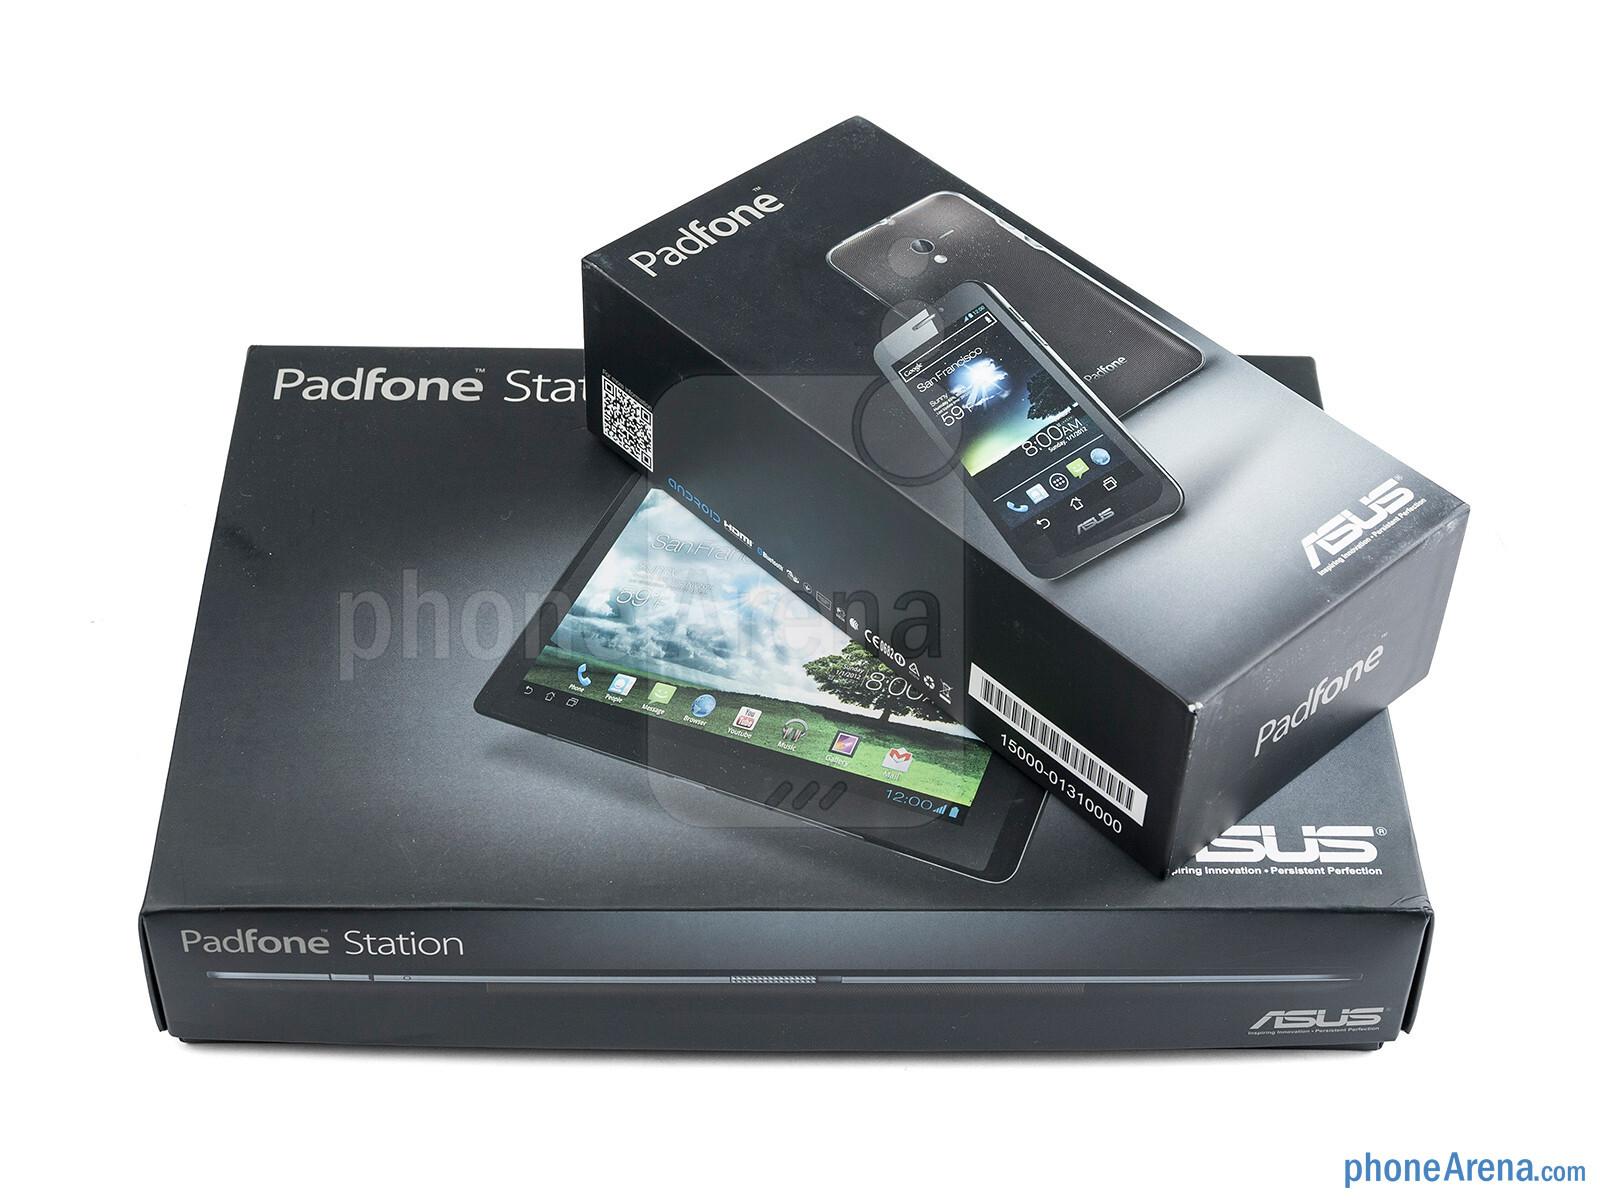 Asus Tablet Dock Mockup Pad E Phone